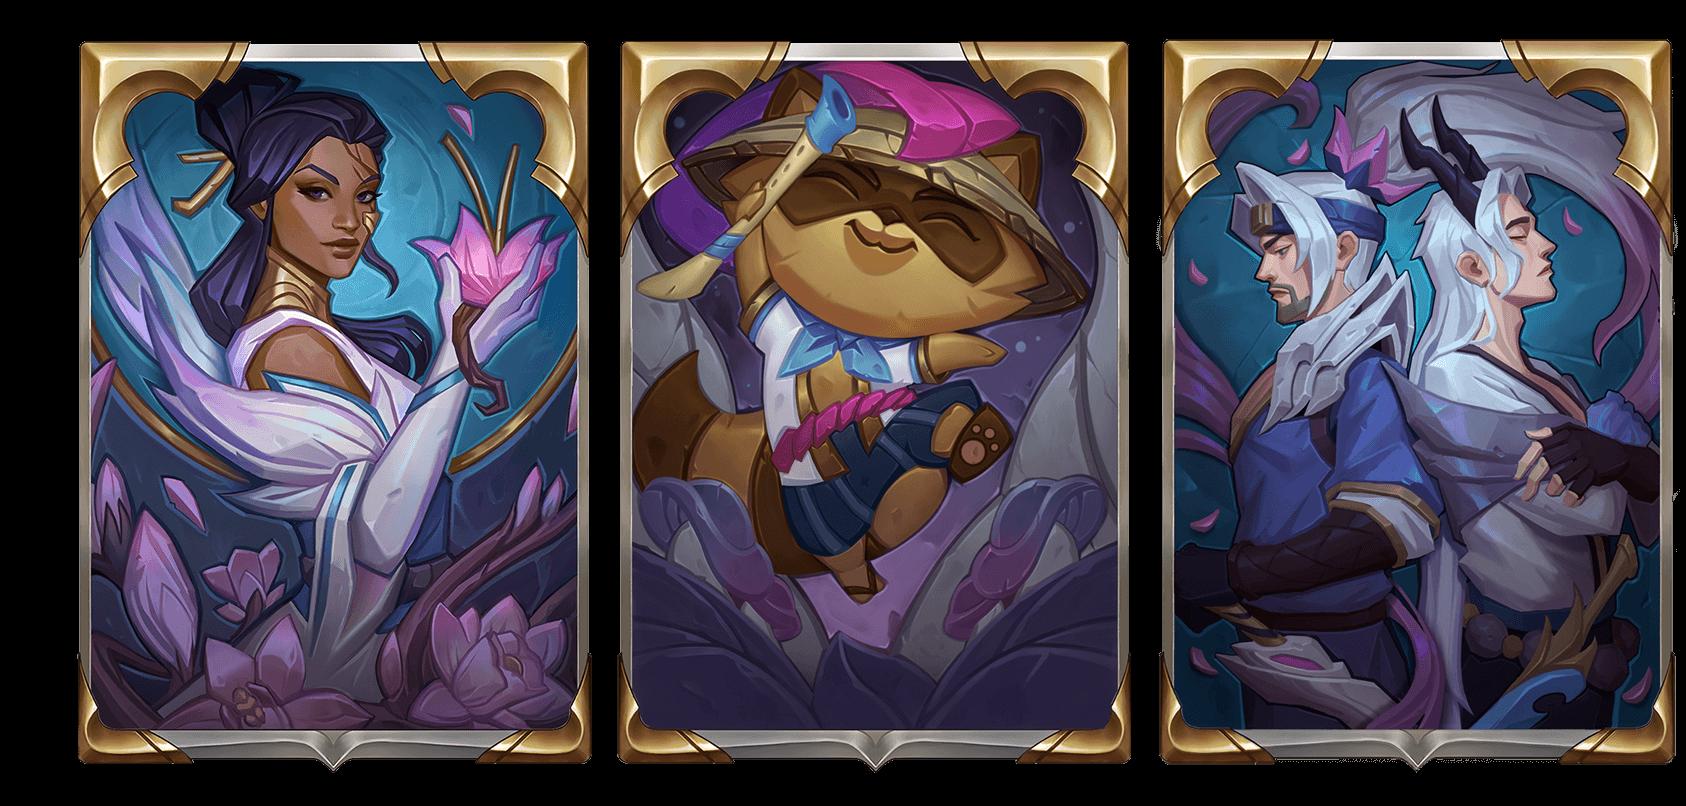 Legends of Runeterra Spirit Blossom Card Backs